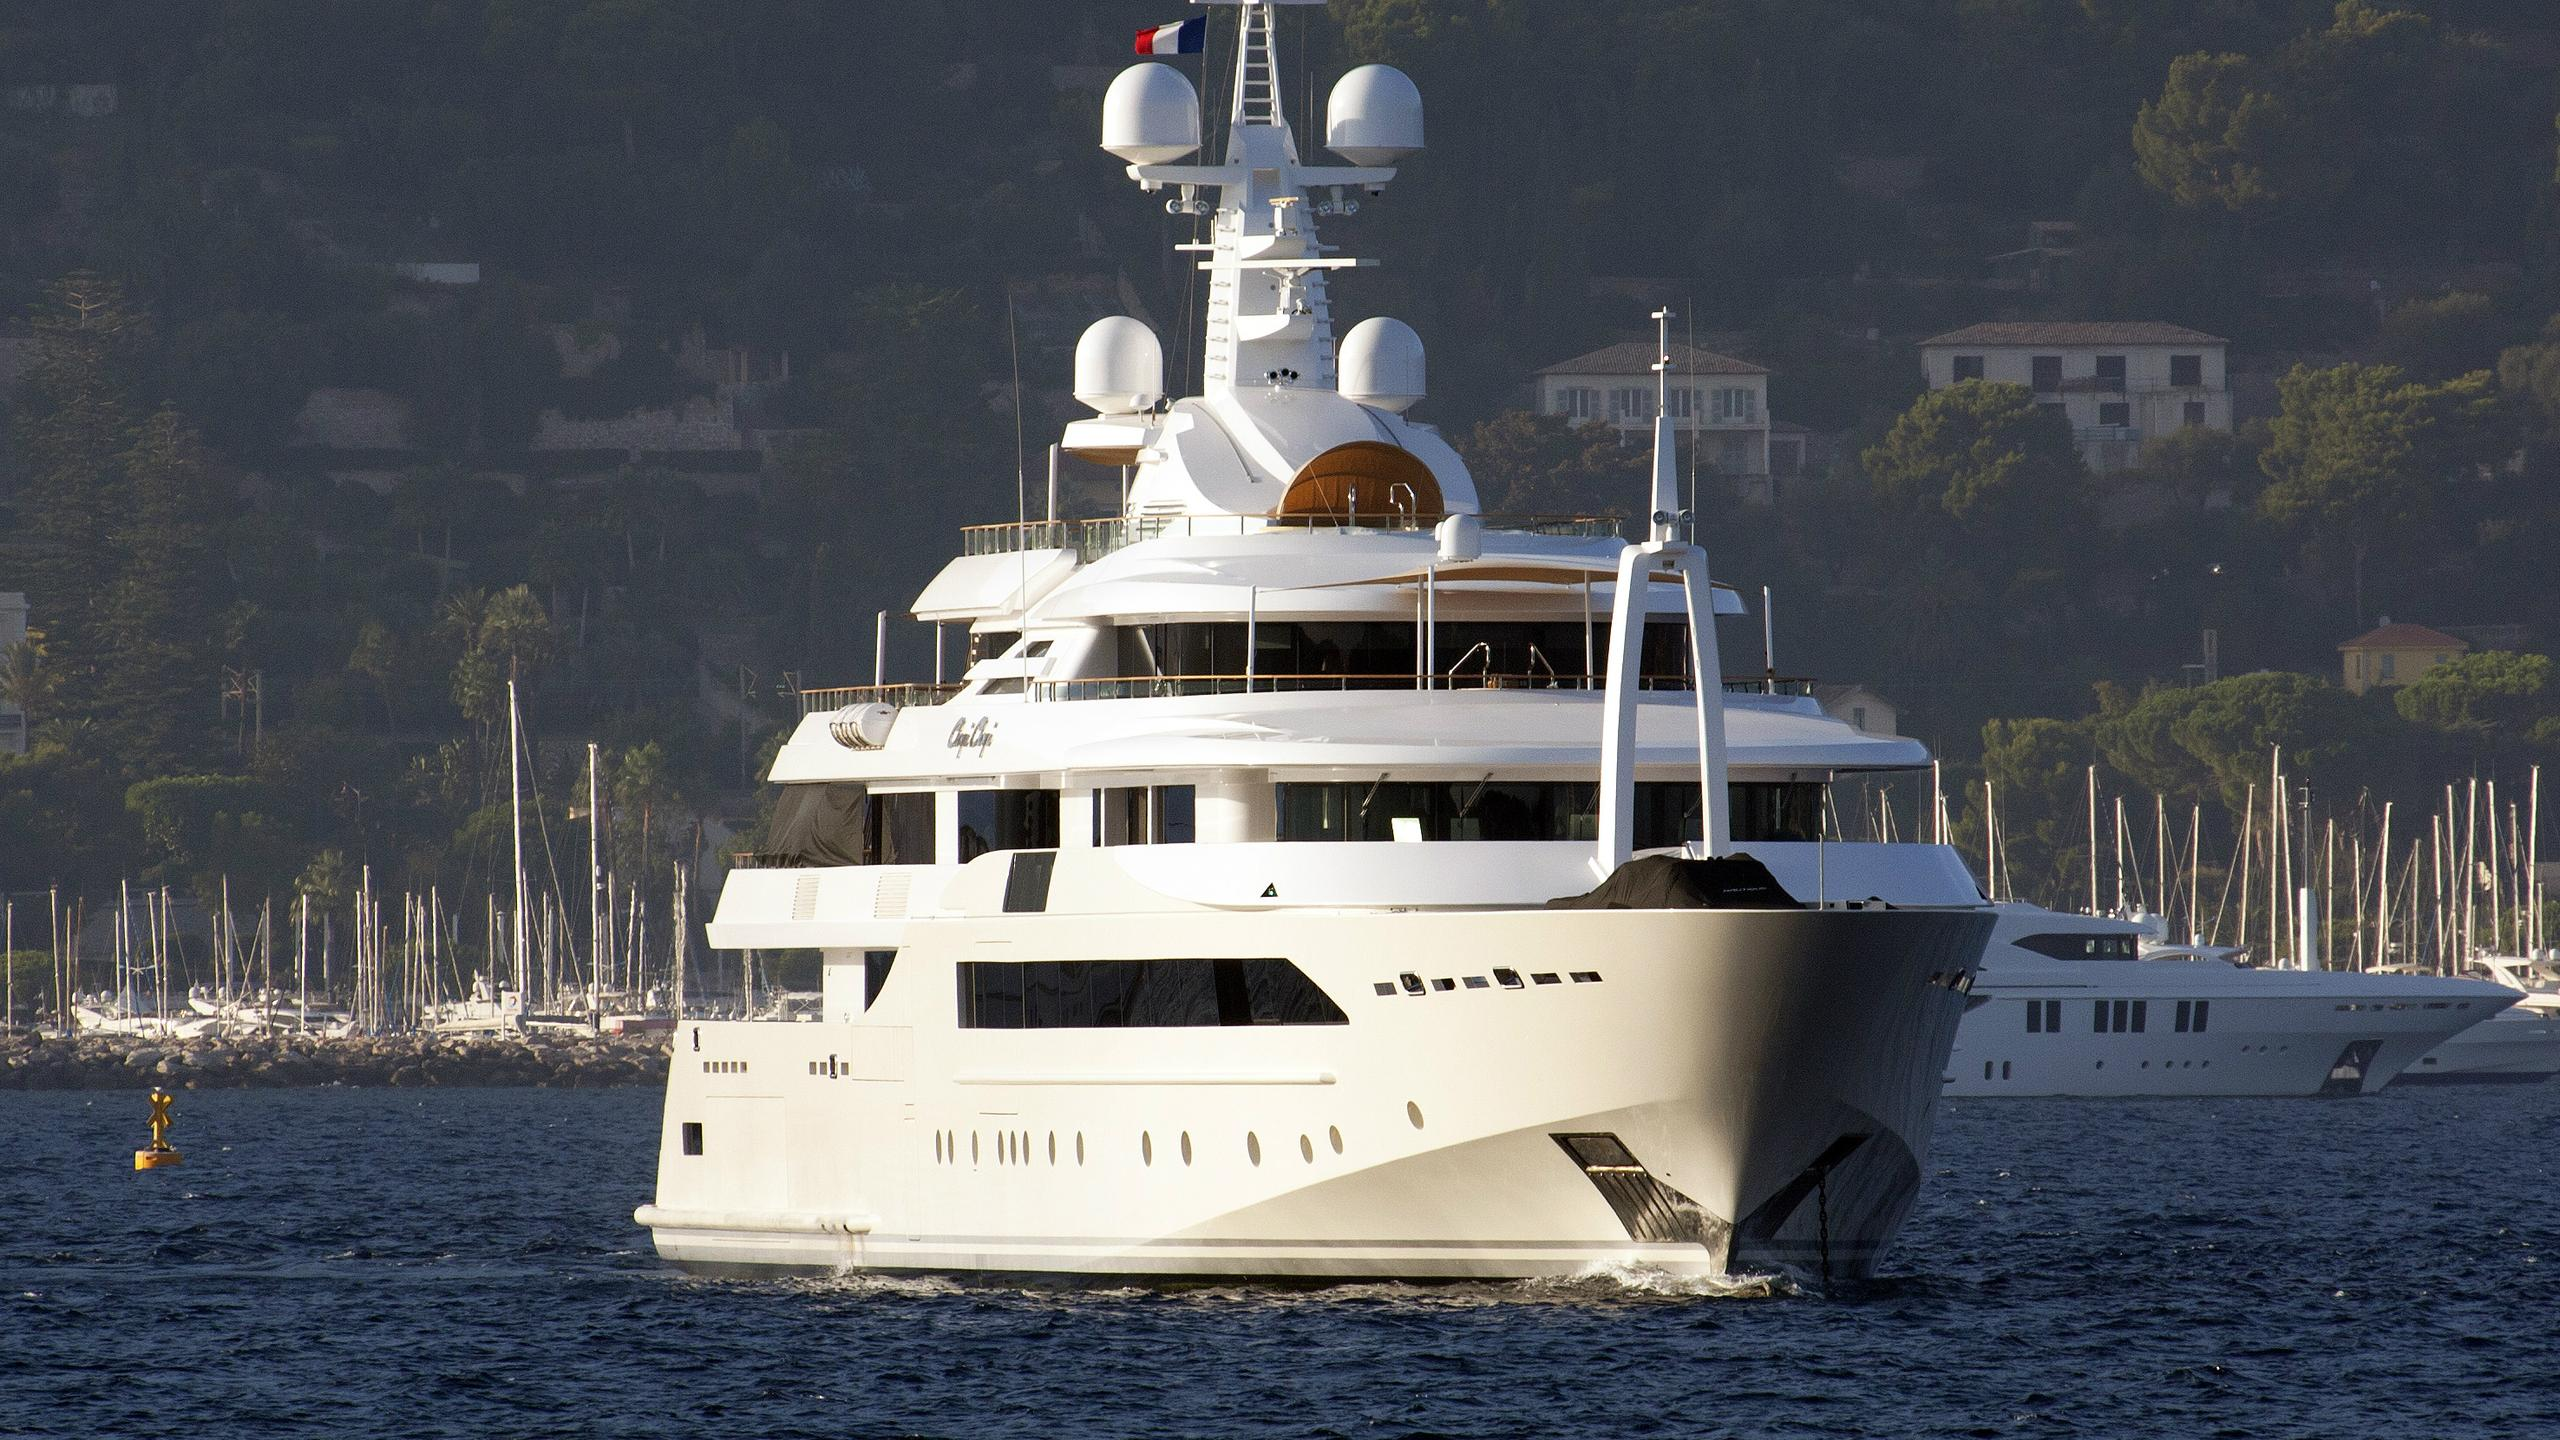 chopi-chopi-motor-yacht-crn-2013-80m-half-profile